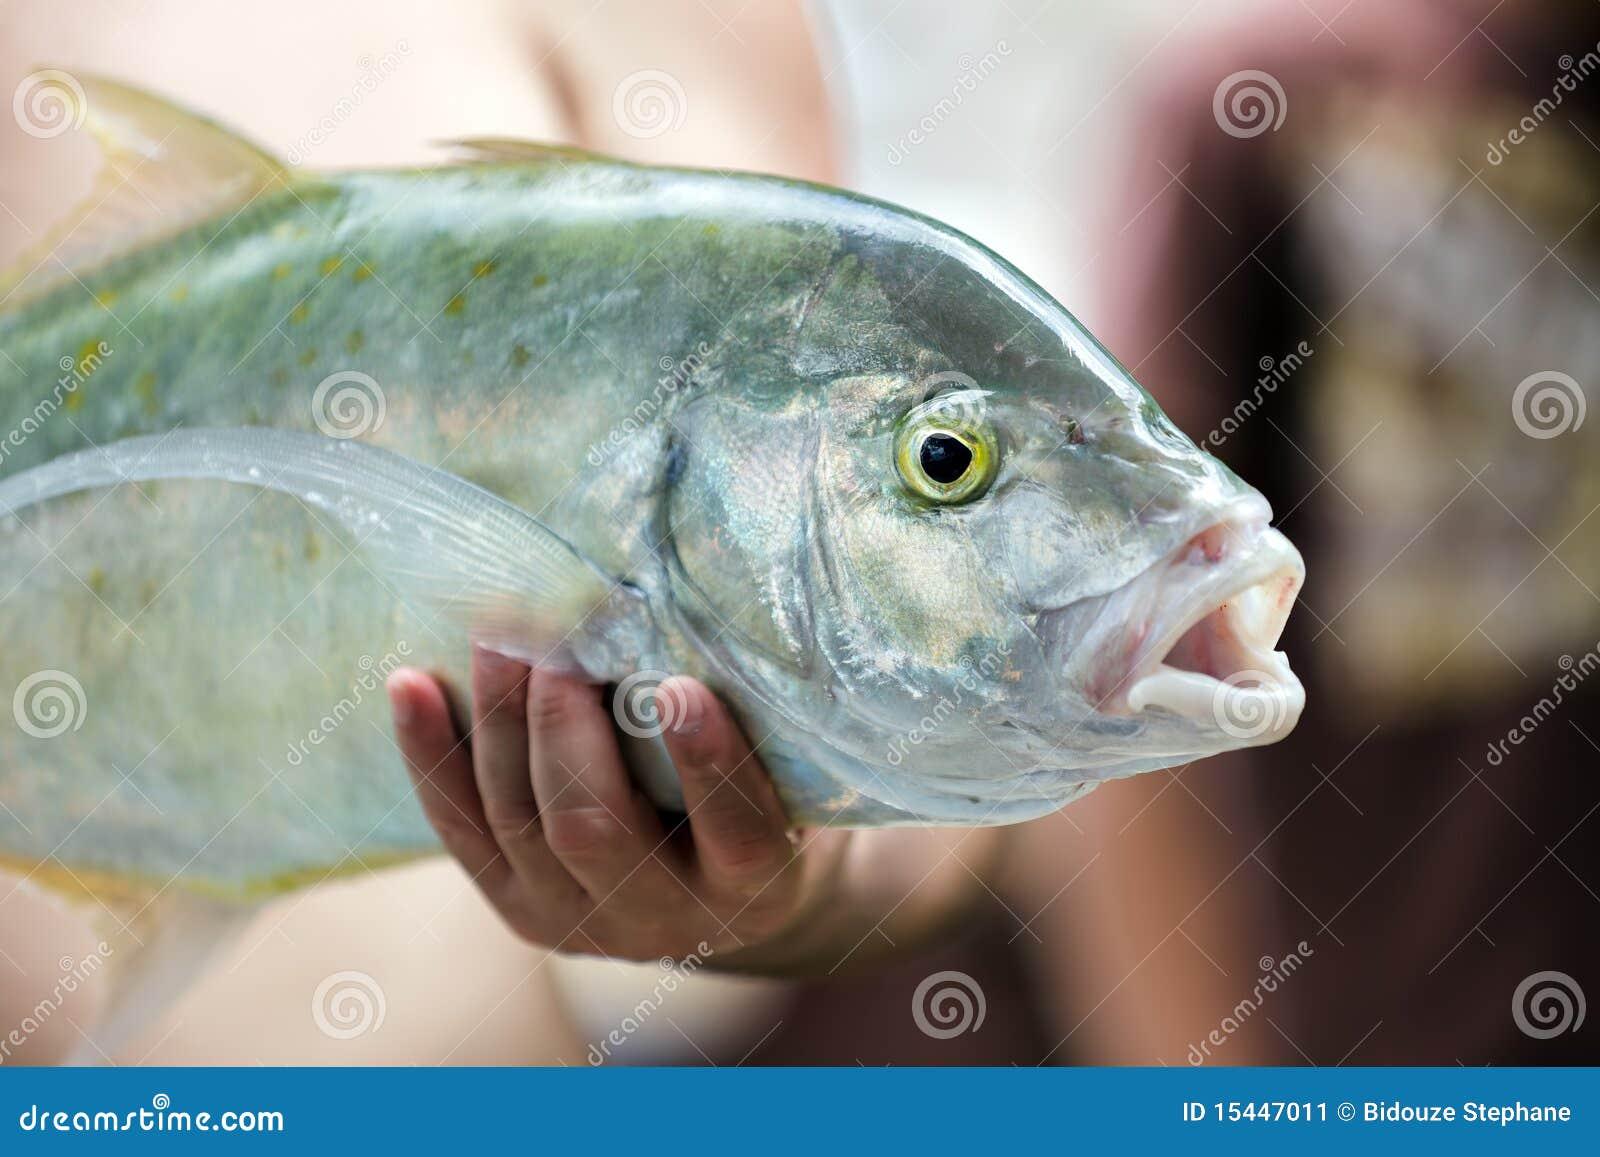 Fisherman holding fresh big tropical silver fish.